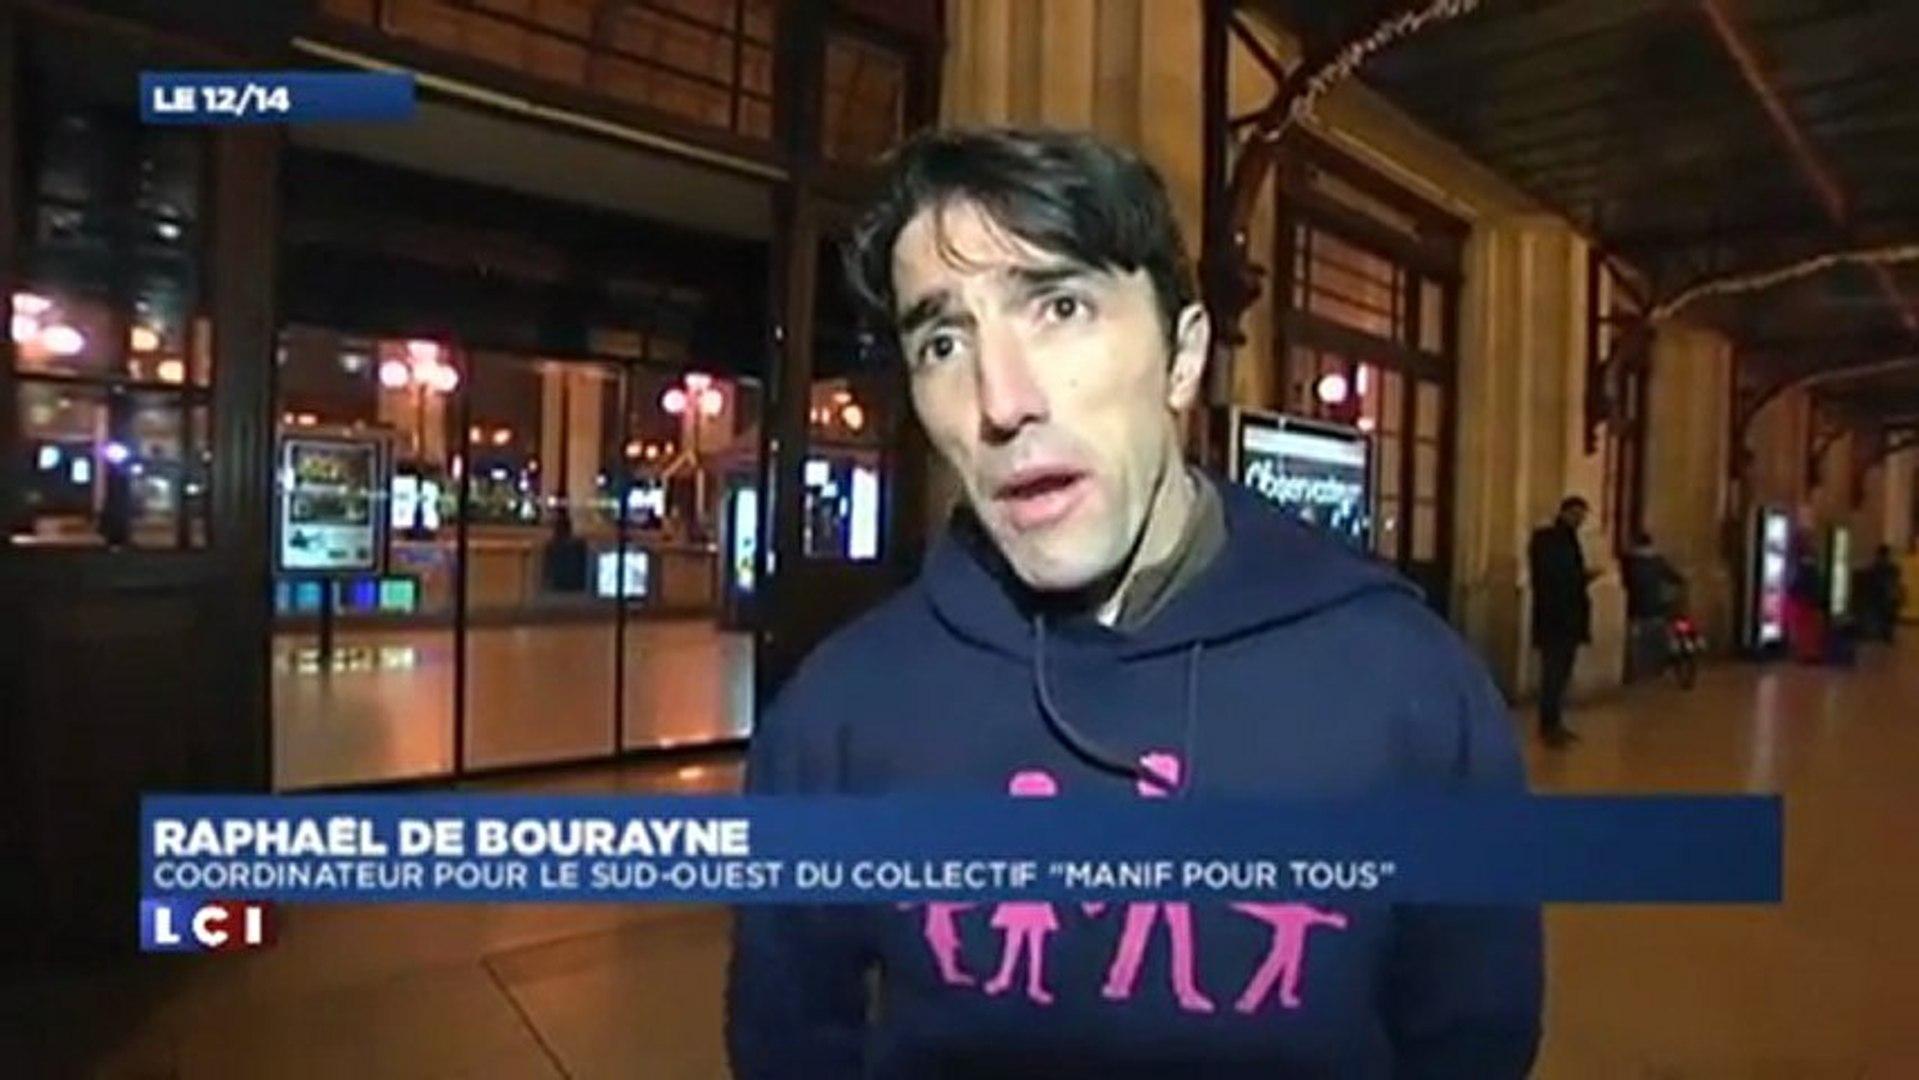 09/01/13 TF1 News La stratégie internet des anti-mariage gay en France